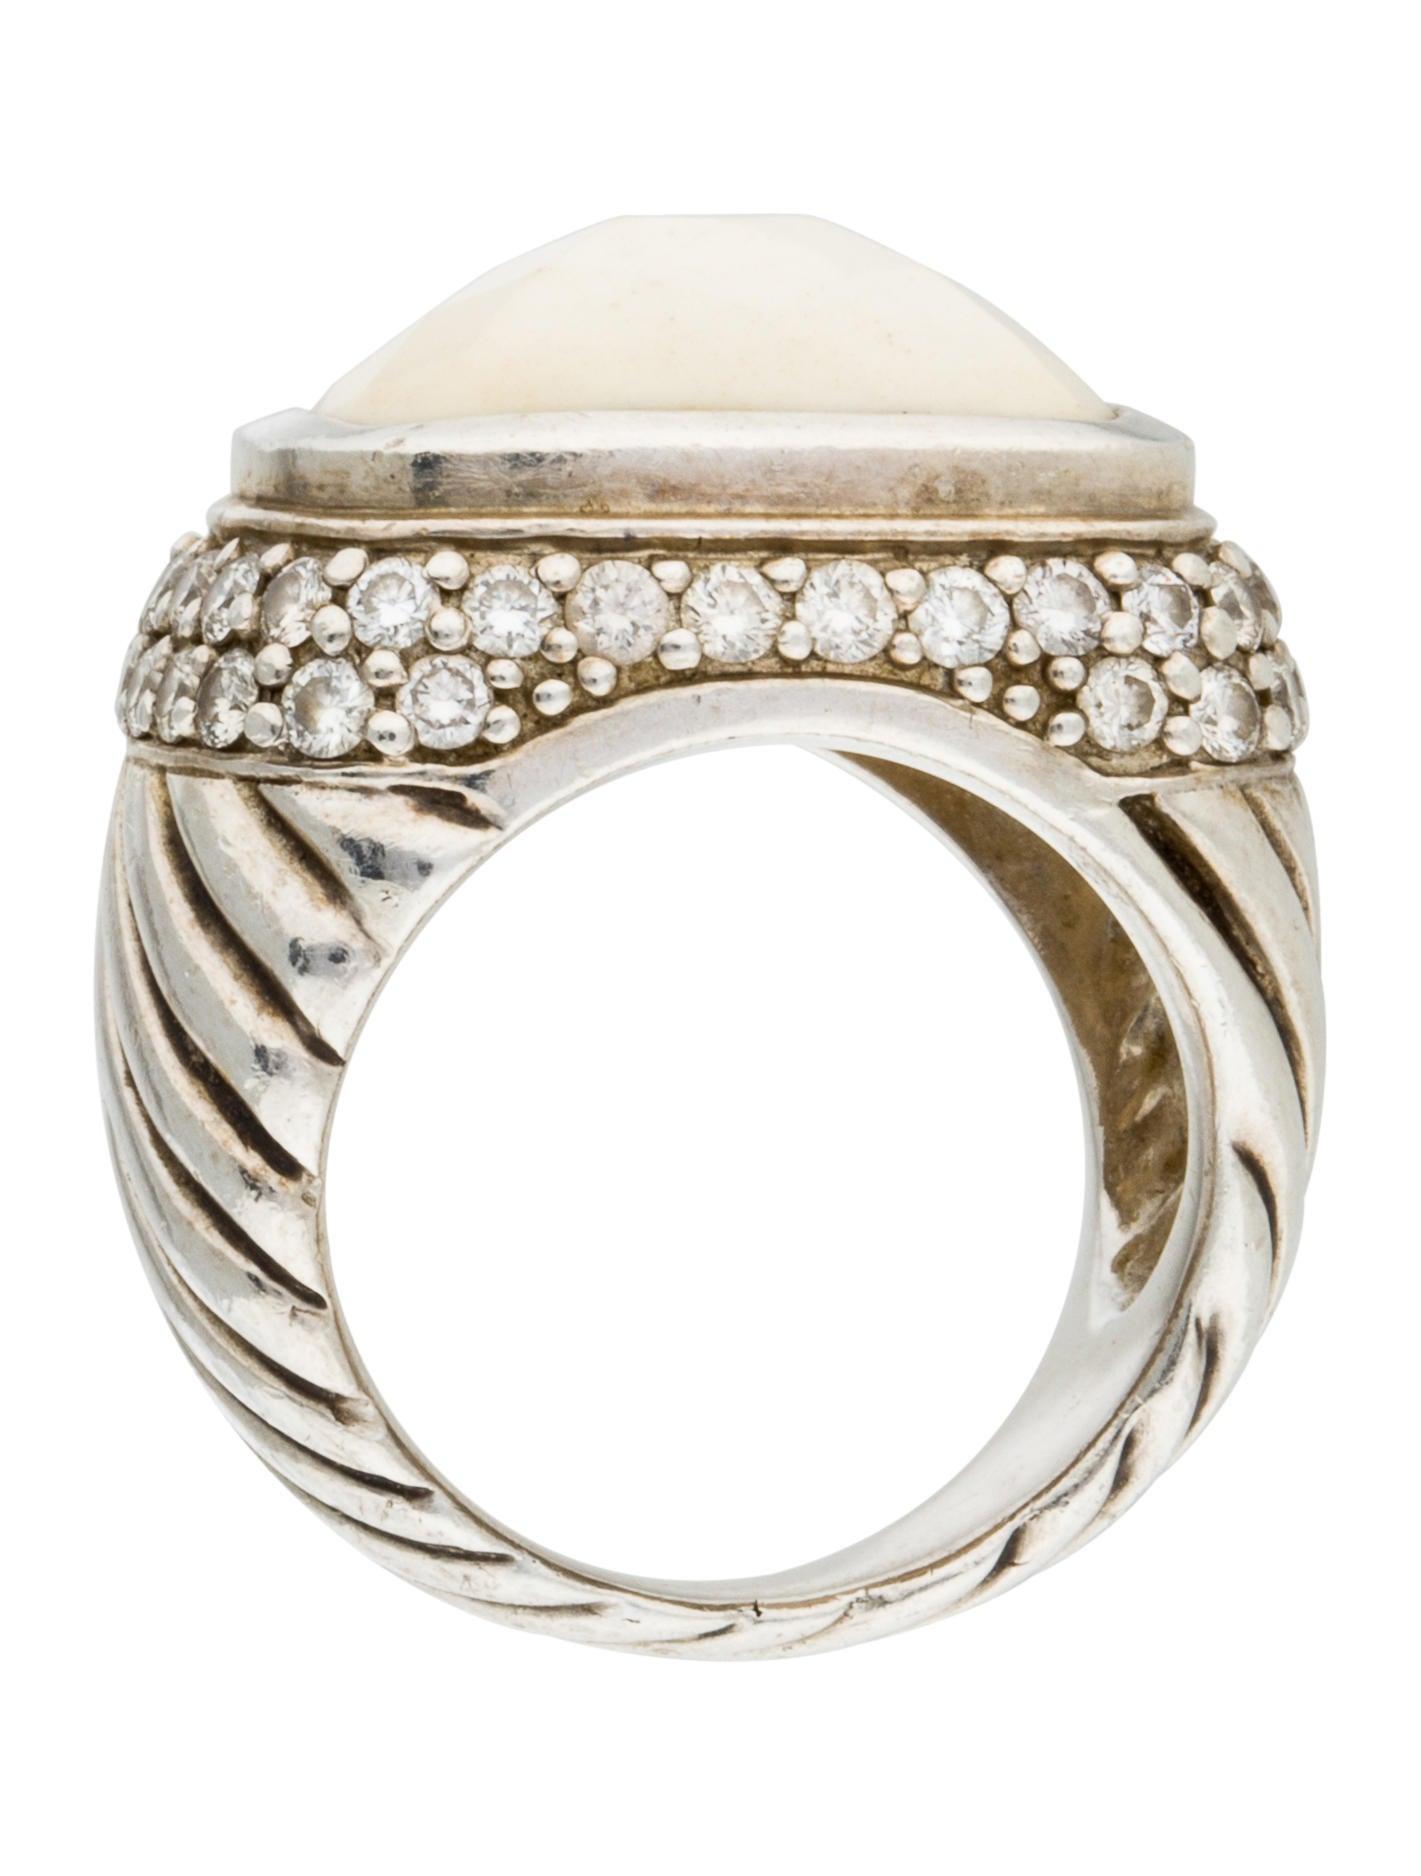 David yurman white agate diamond ring rings dvy32324 for David yurman inspired jewelry rings